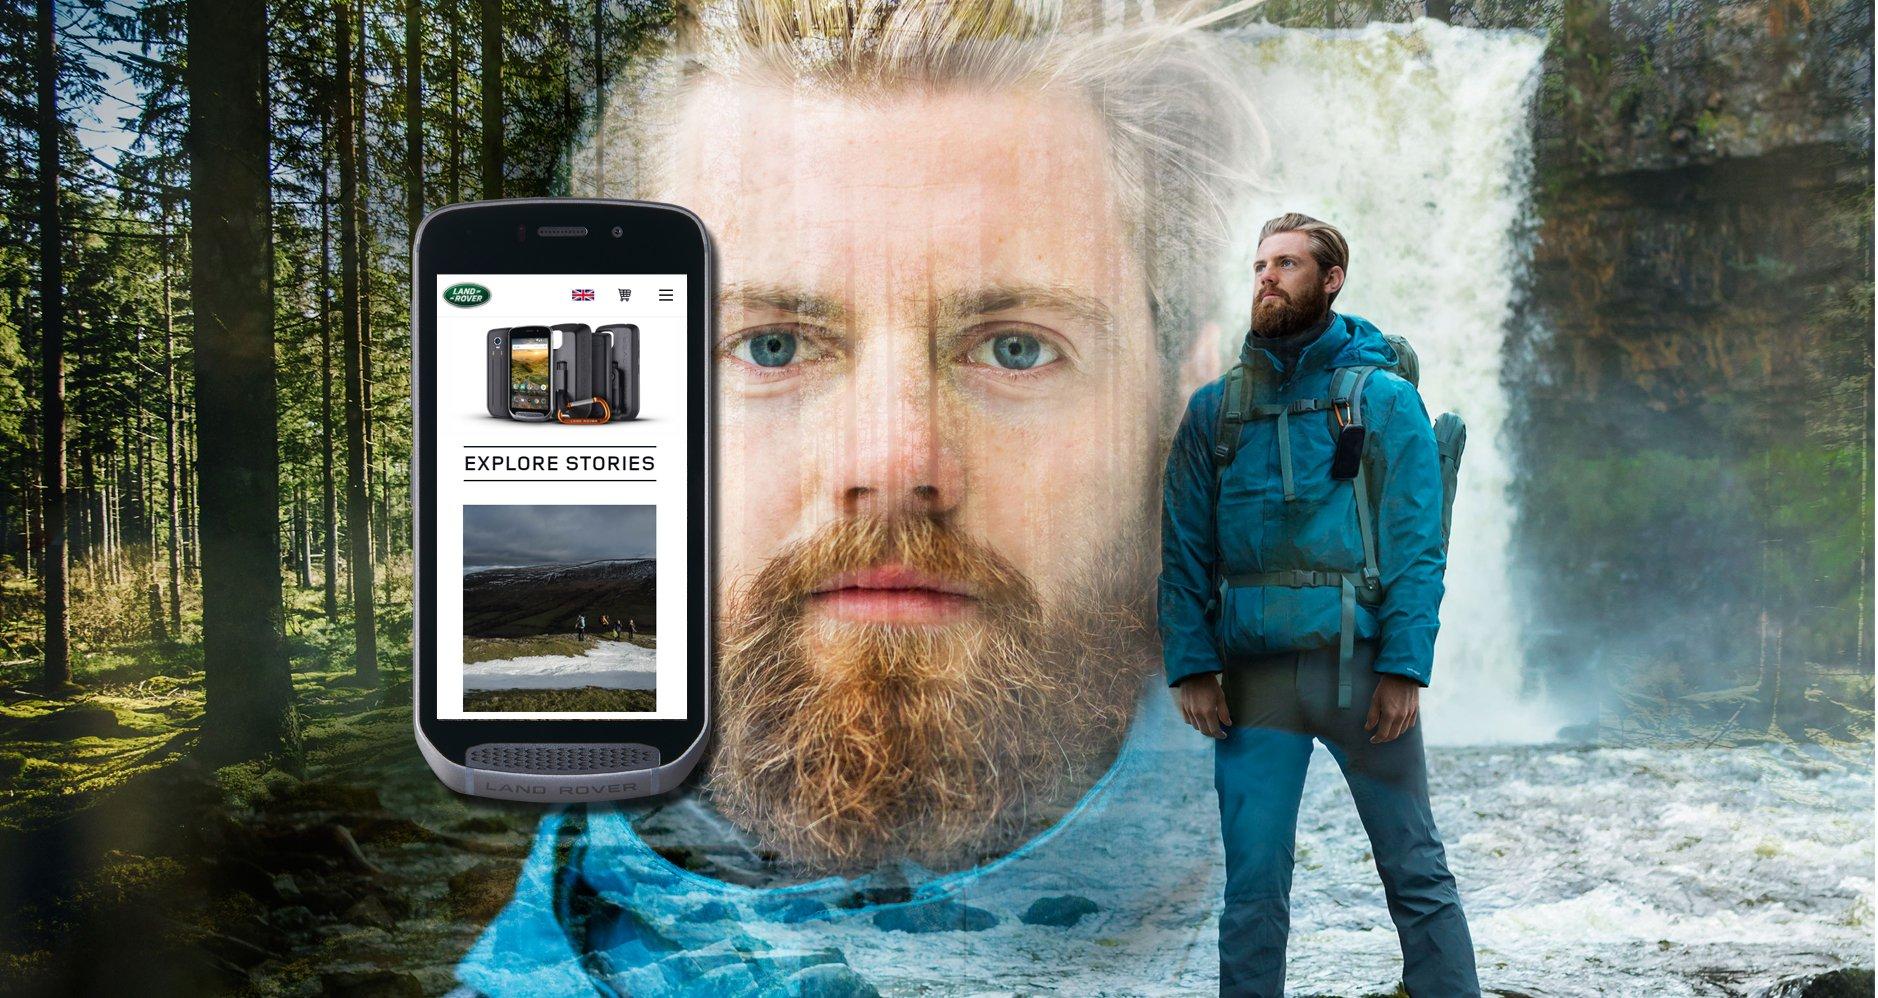 Landrover Explore Outdoor Phone